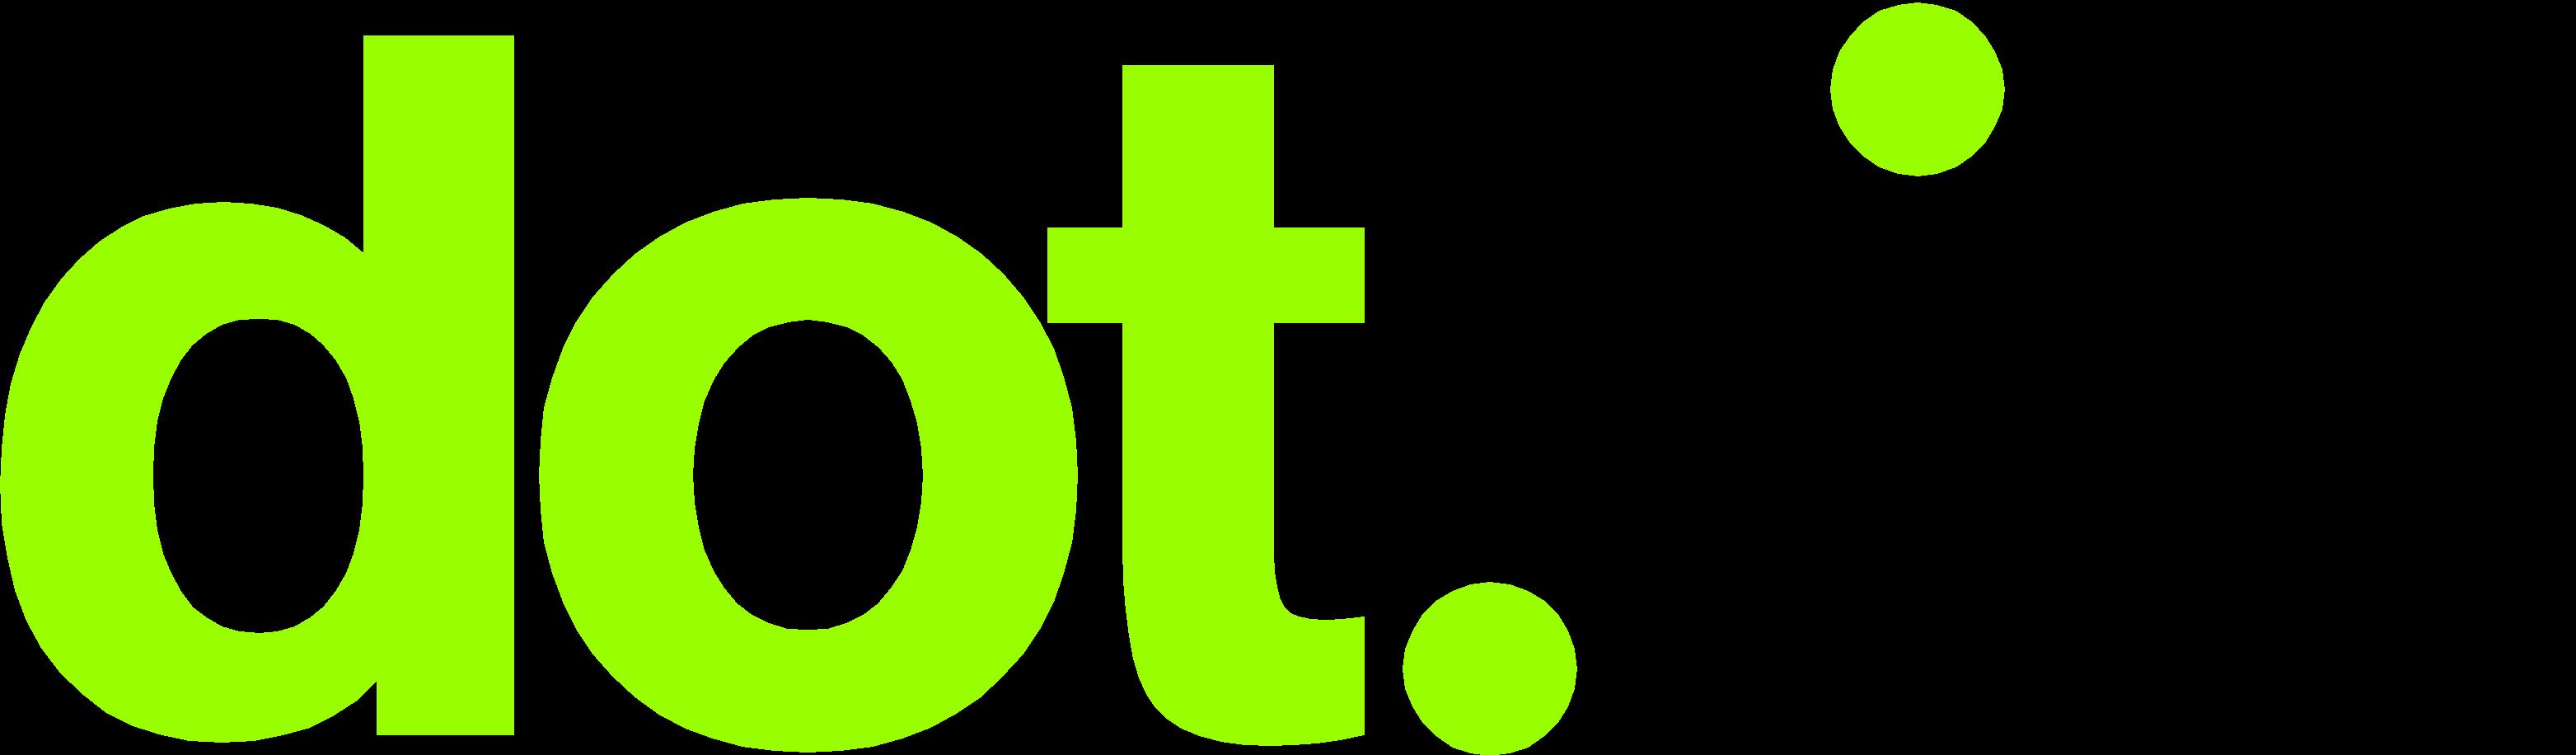 3DotLib